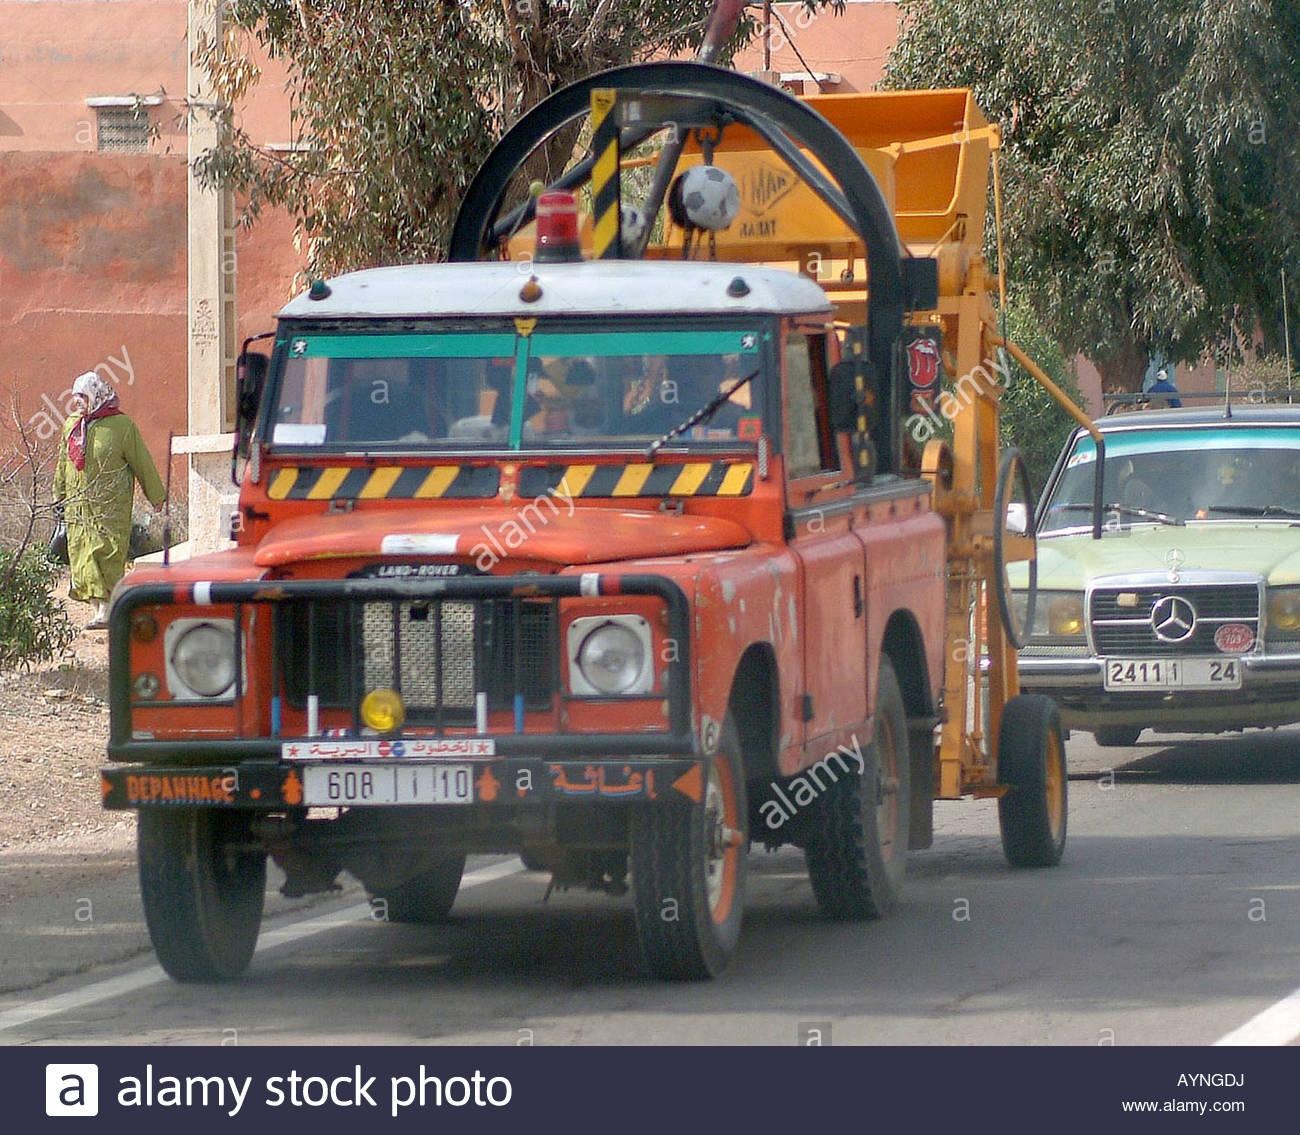 Tow Truck Land Rover Red Mechanic Garage Repair Vehicle